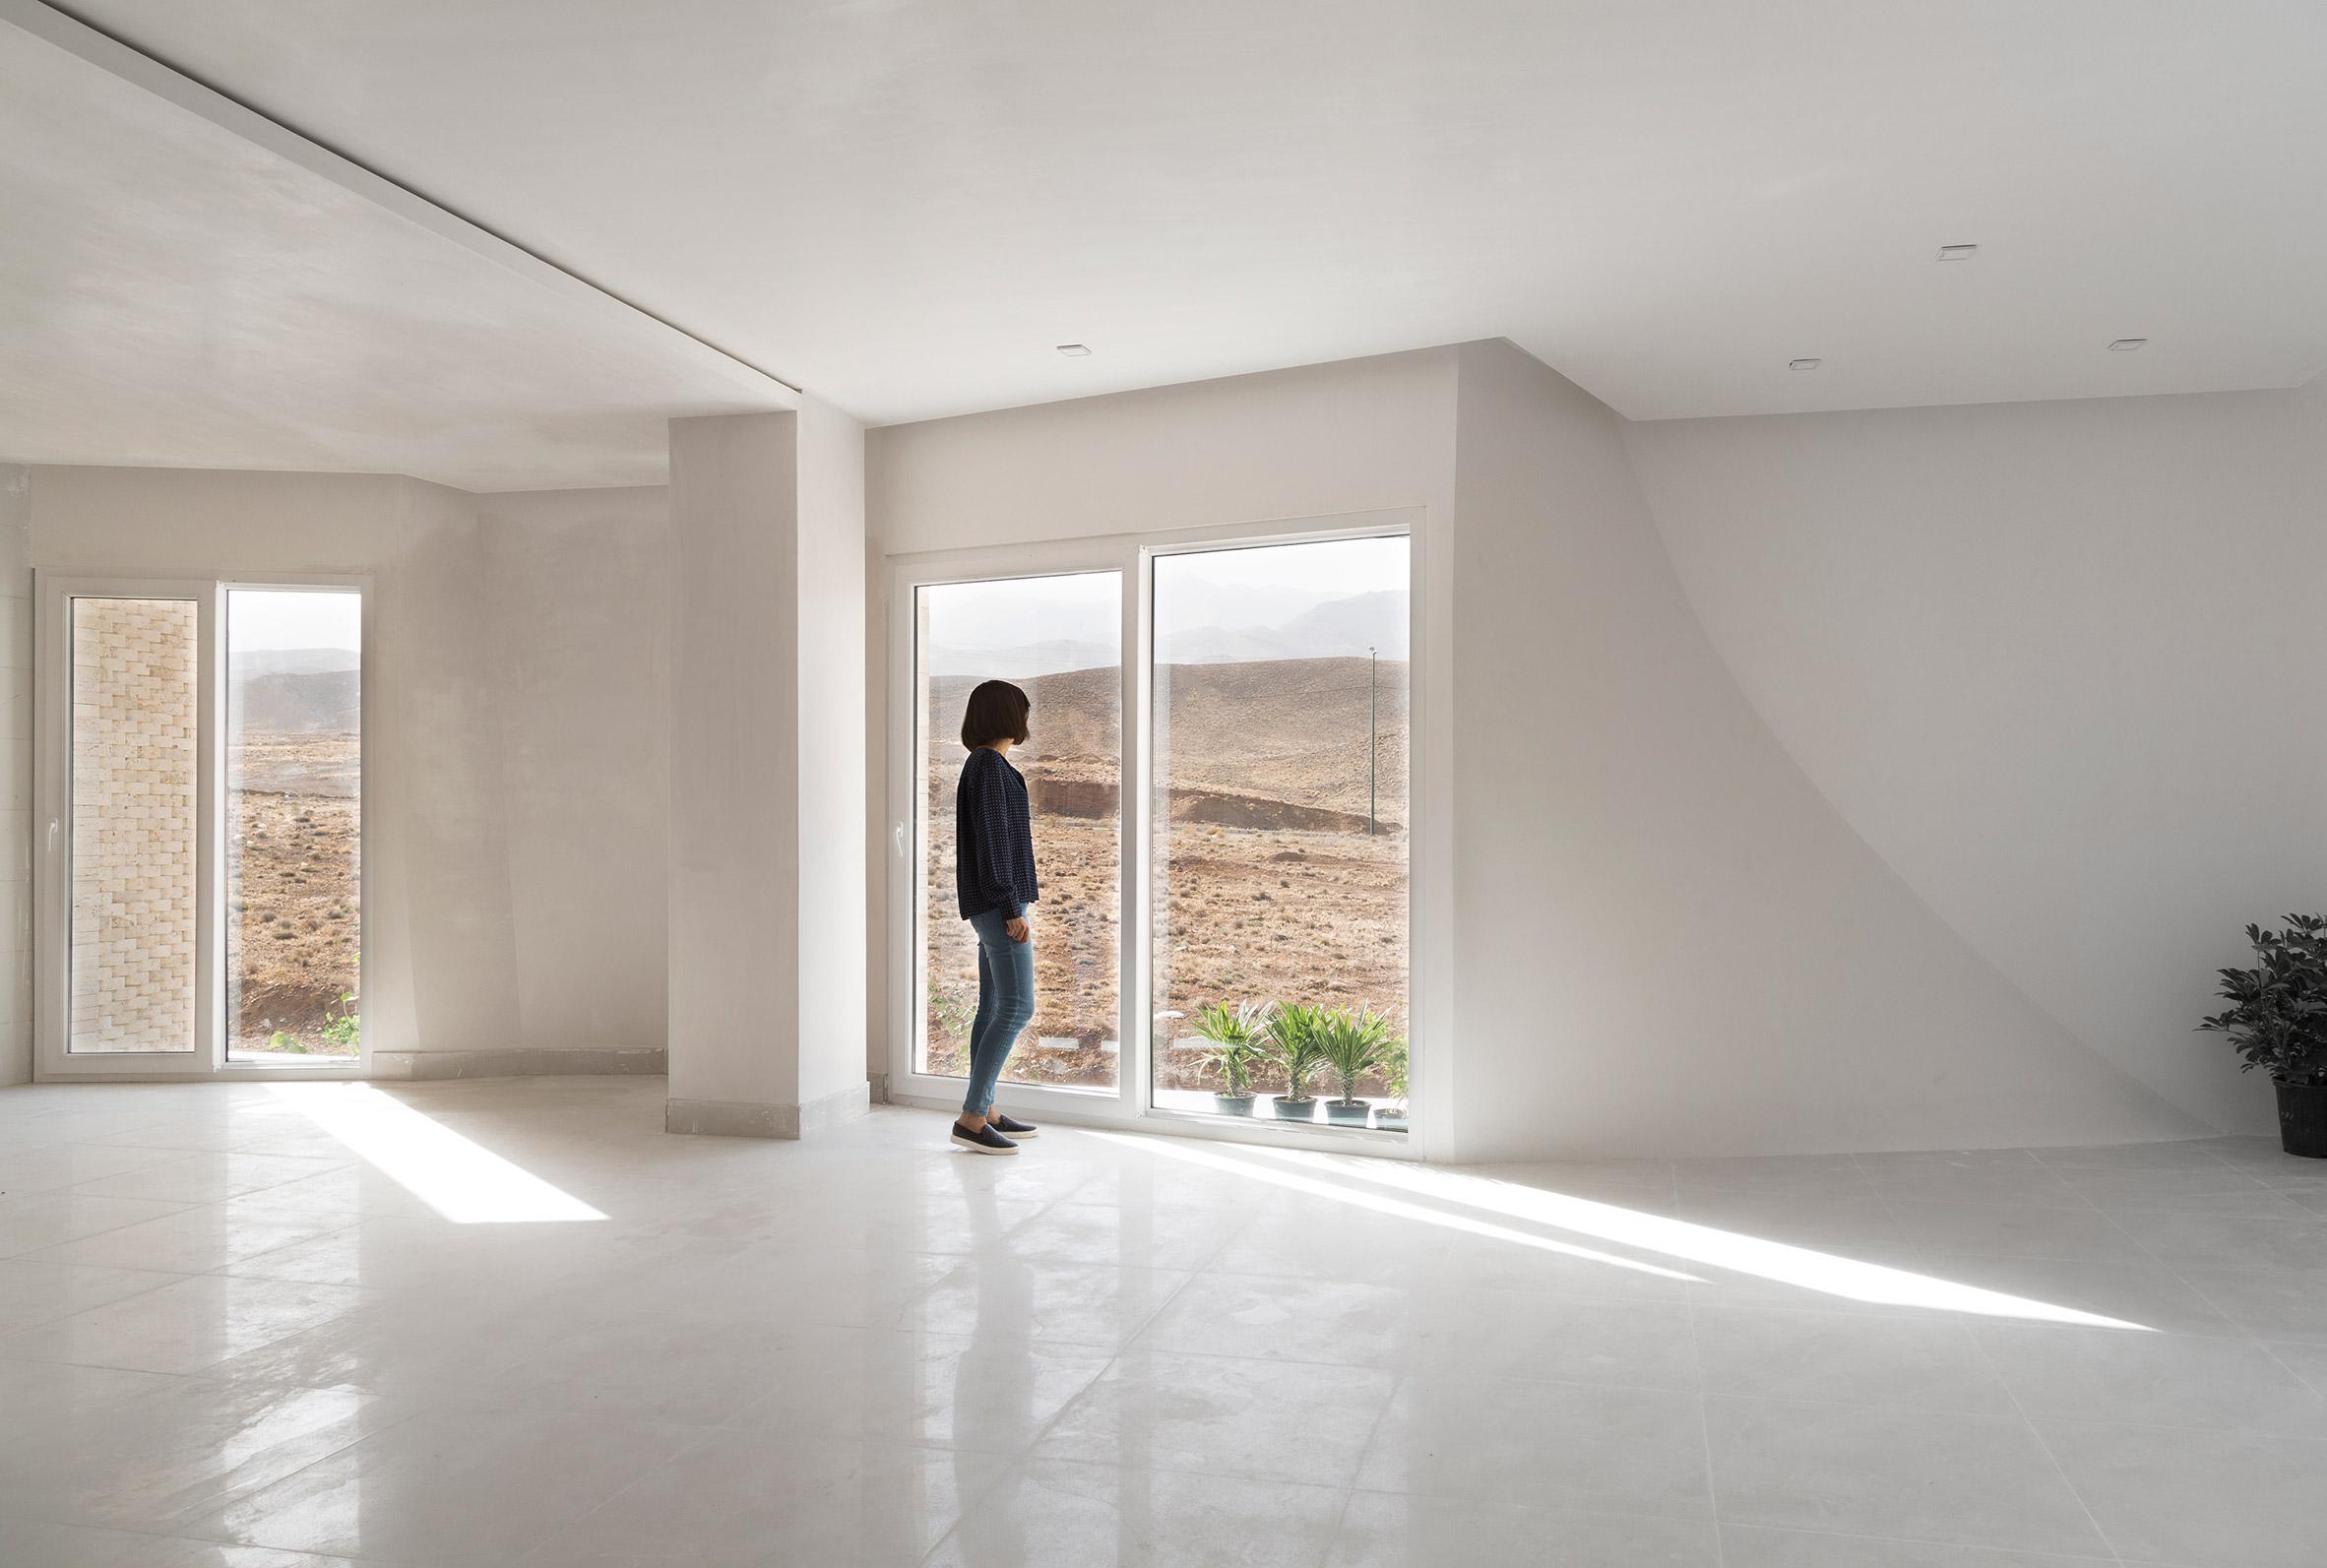 Mahallat residential building by CAAT Studio